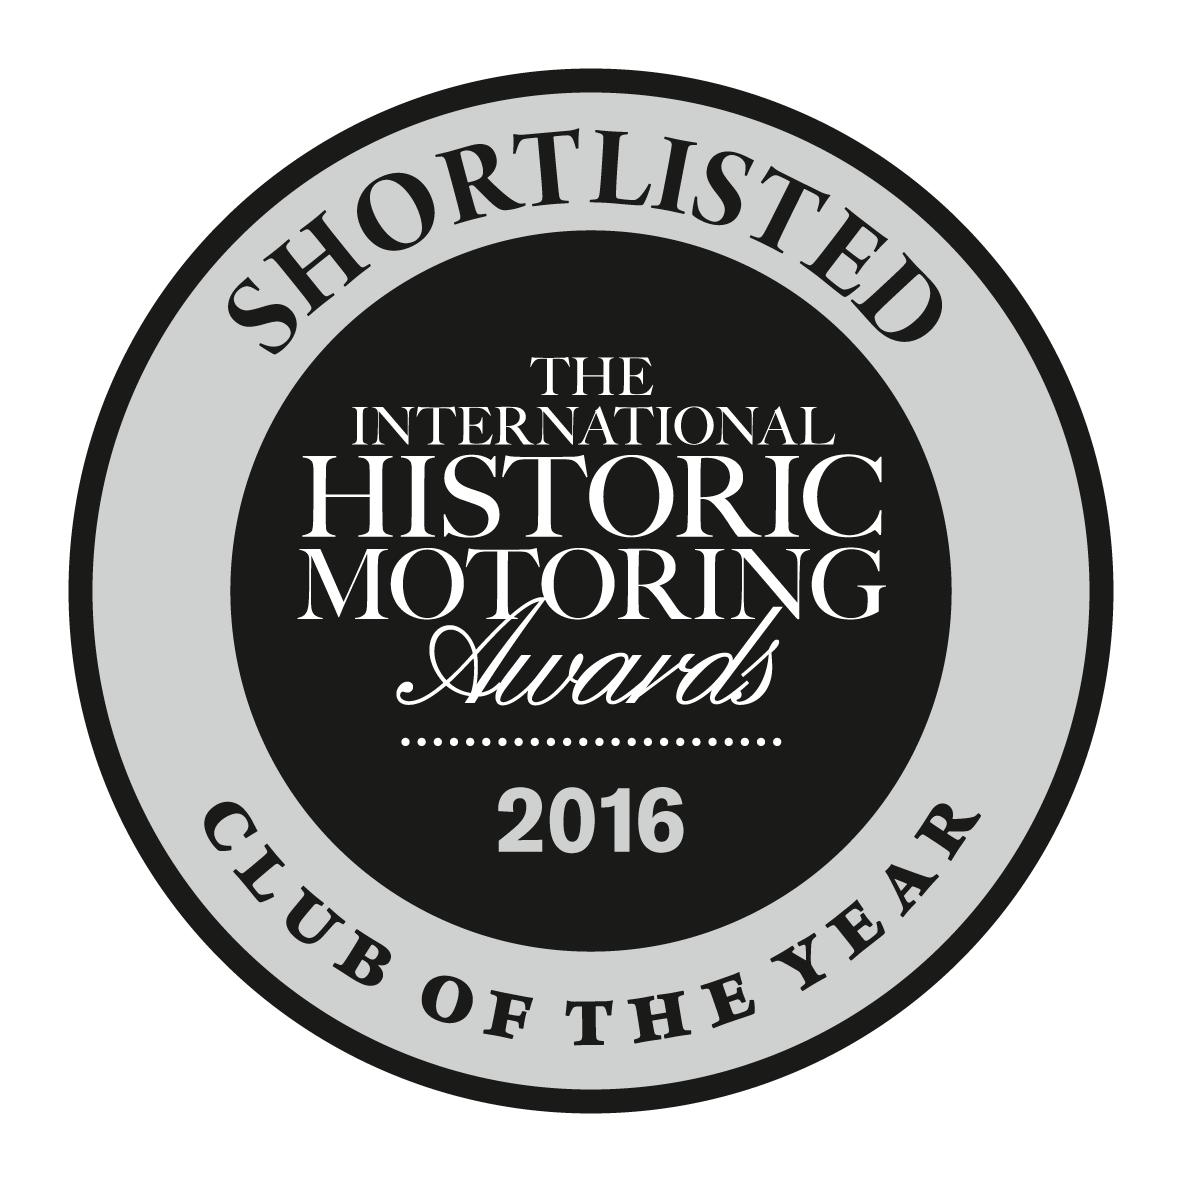 TR Register Shortlisted in the 2016 International Historic Motoring Awards